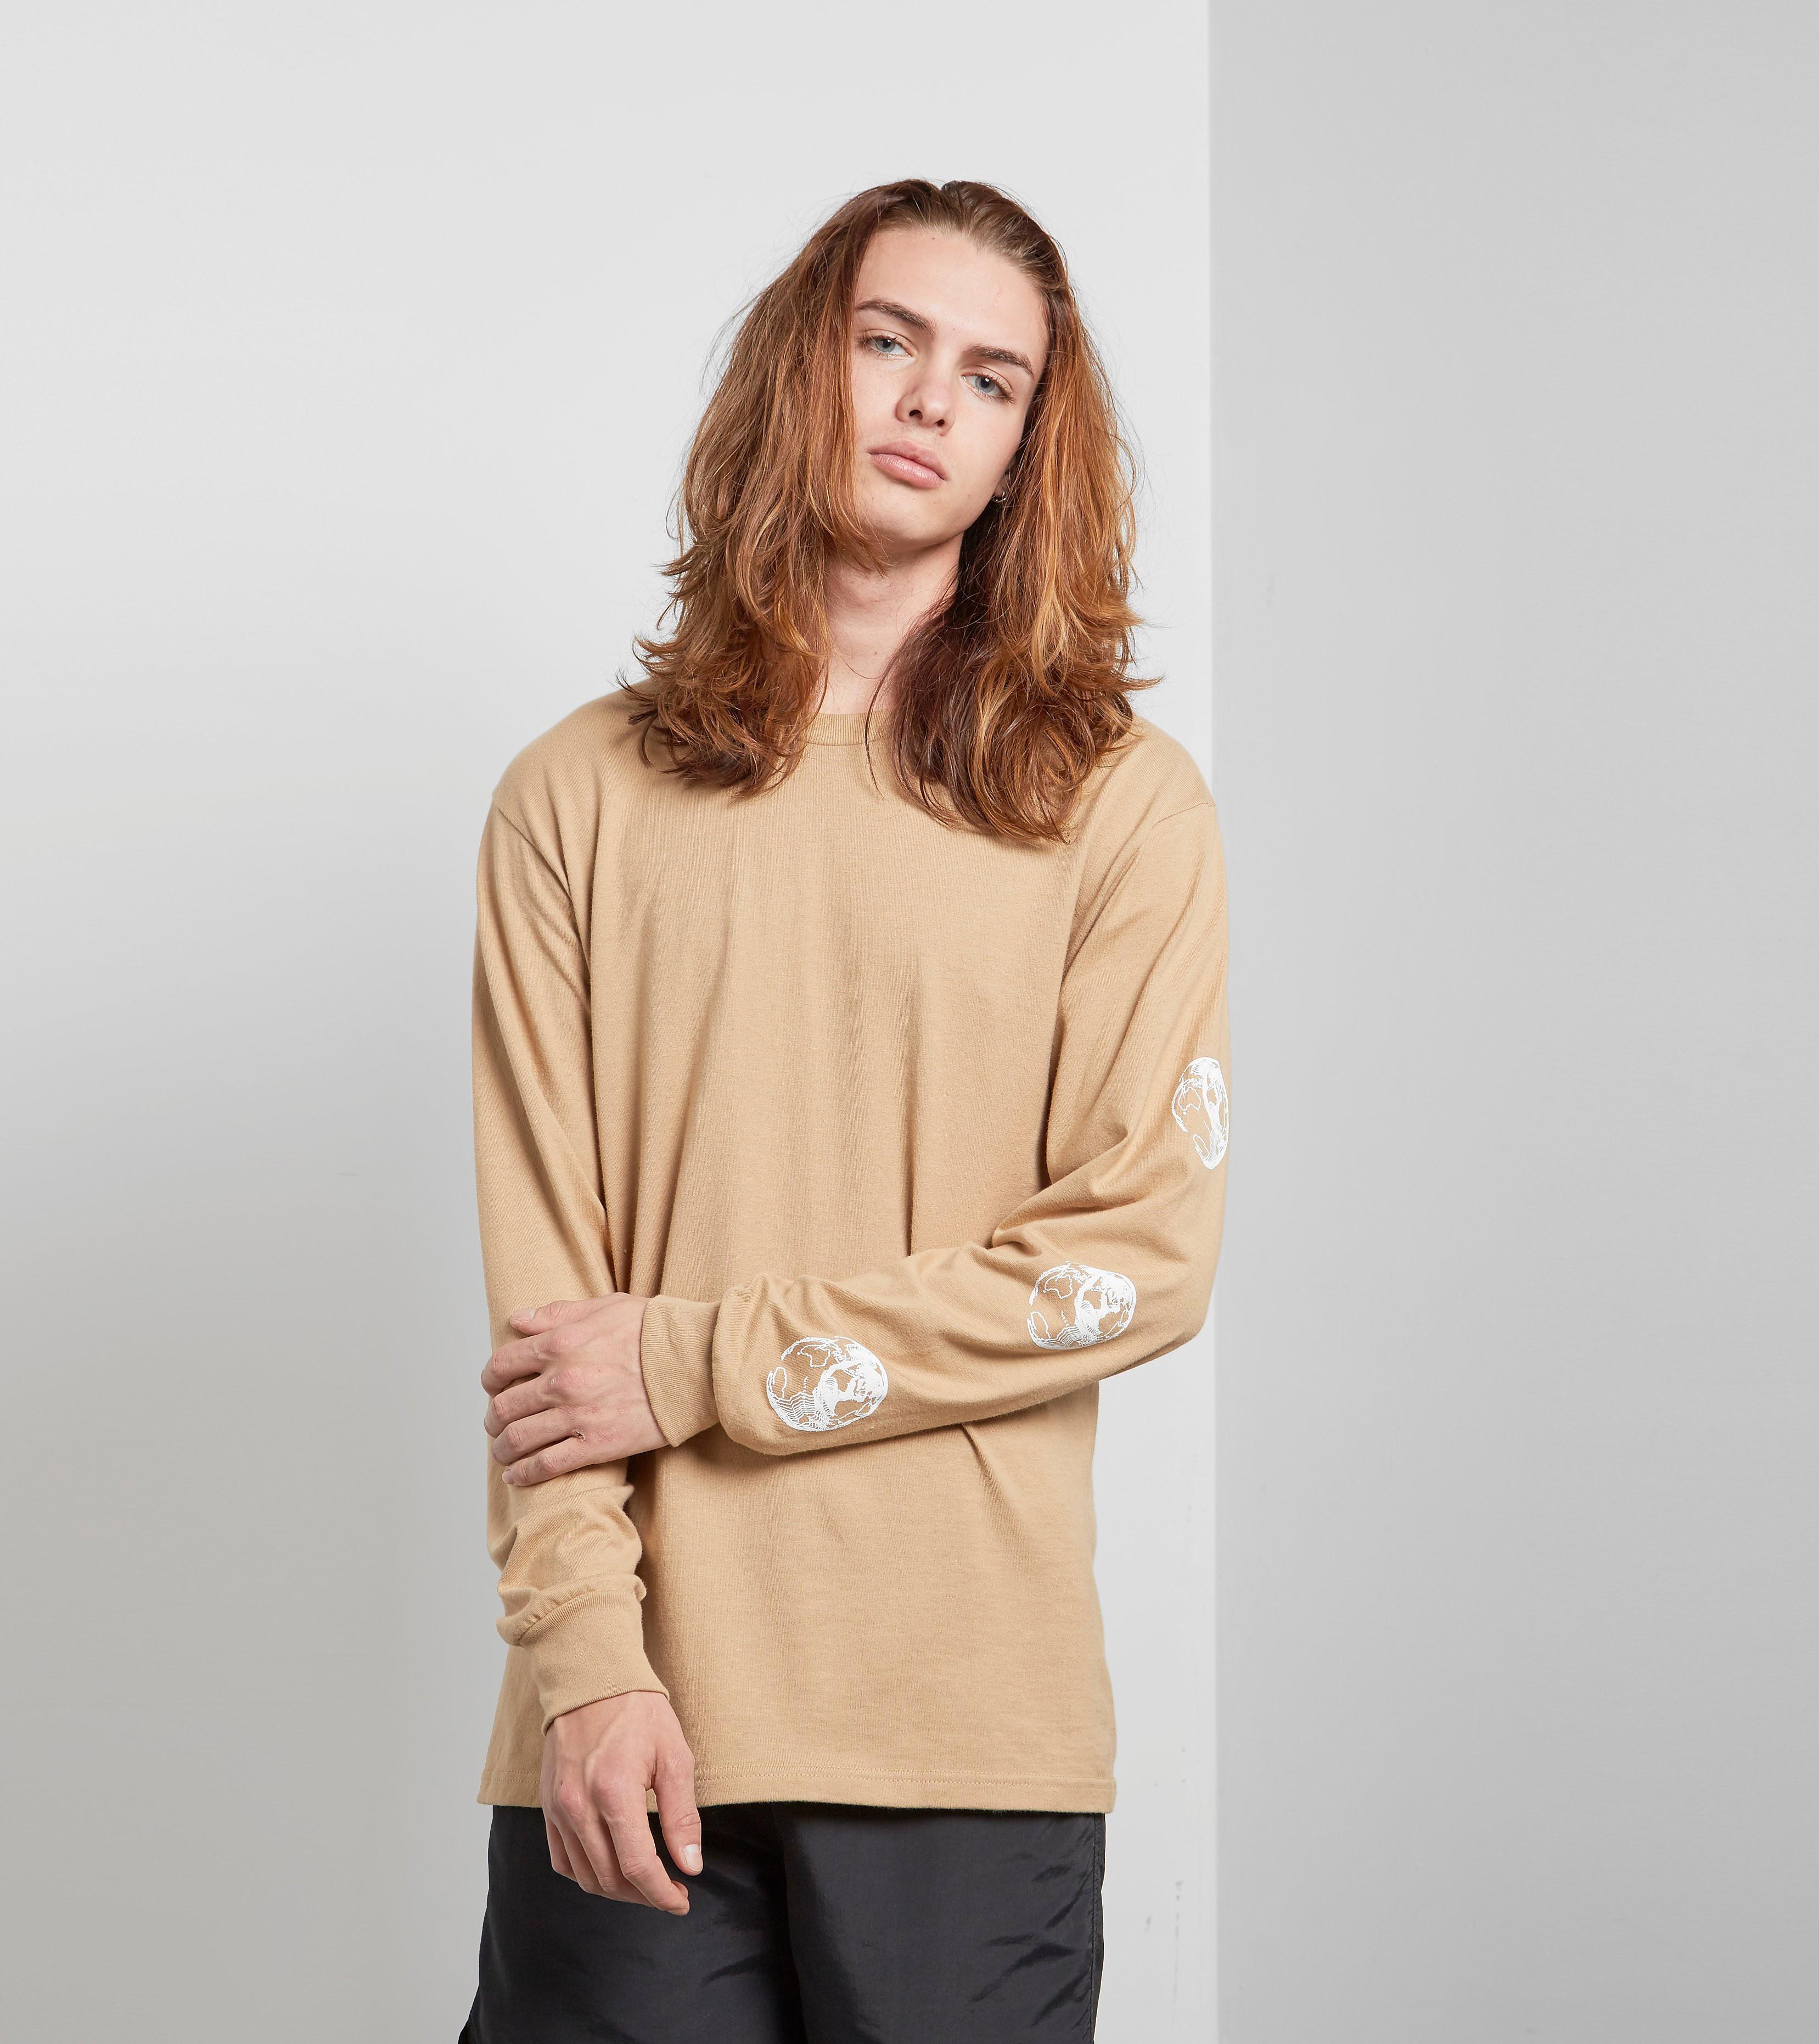 Stussy Long-Sleeved Stock T-Shirt